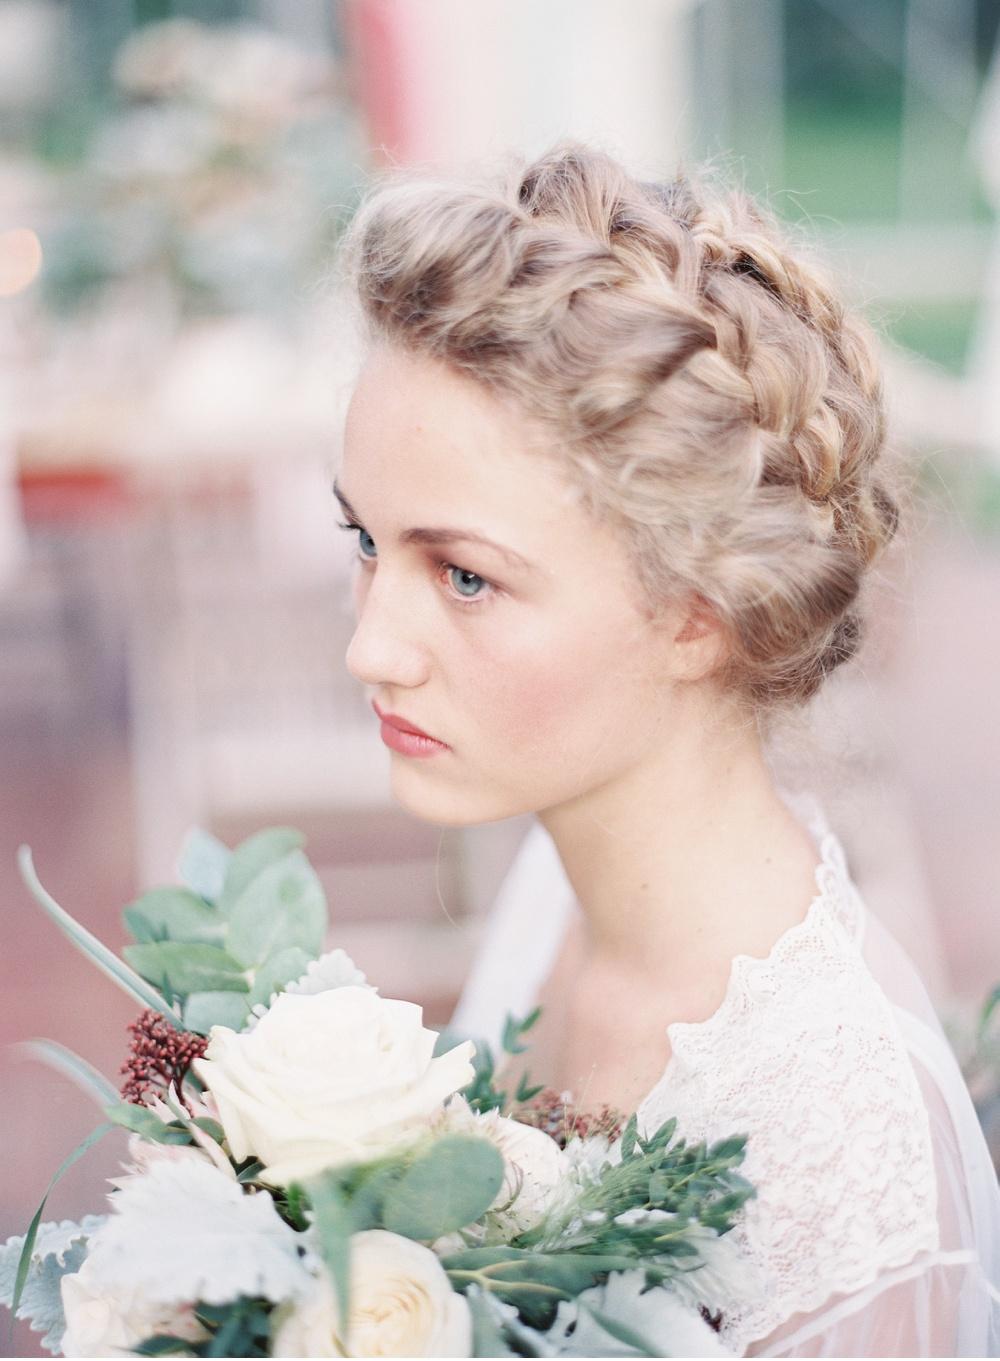 Greenhouse_wedding_inspiration©MadalinaSheldon_0021.jpg